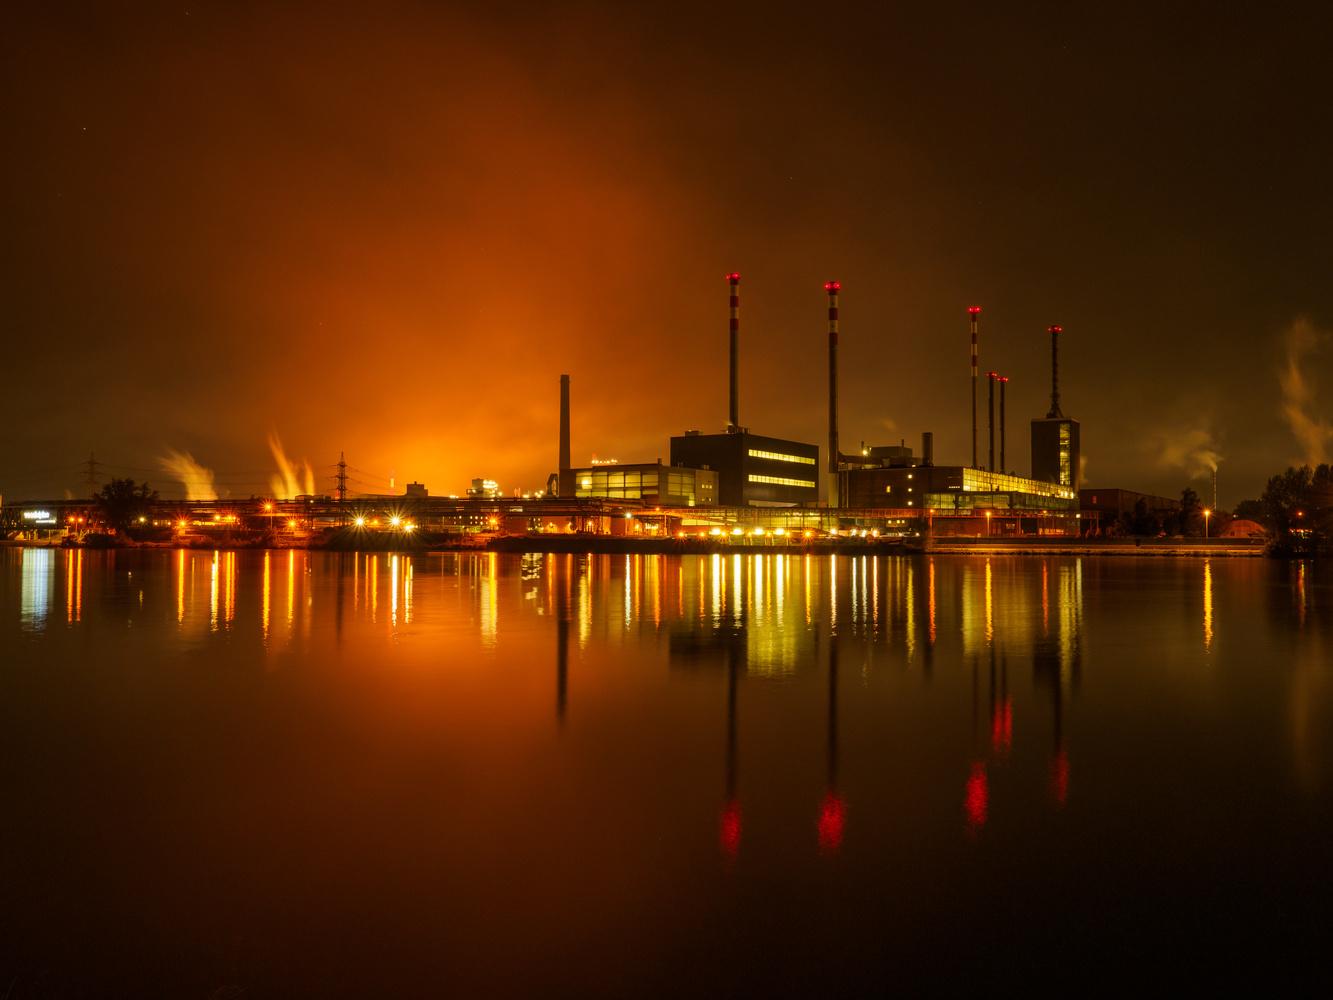 Steel Industry Power Station orange version by Wolfgang Hackl